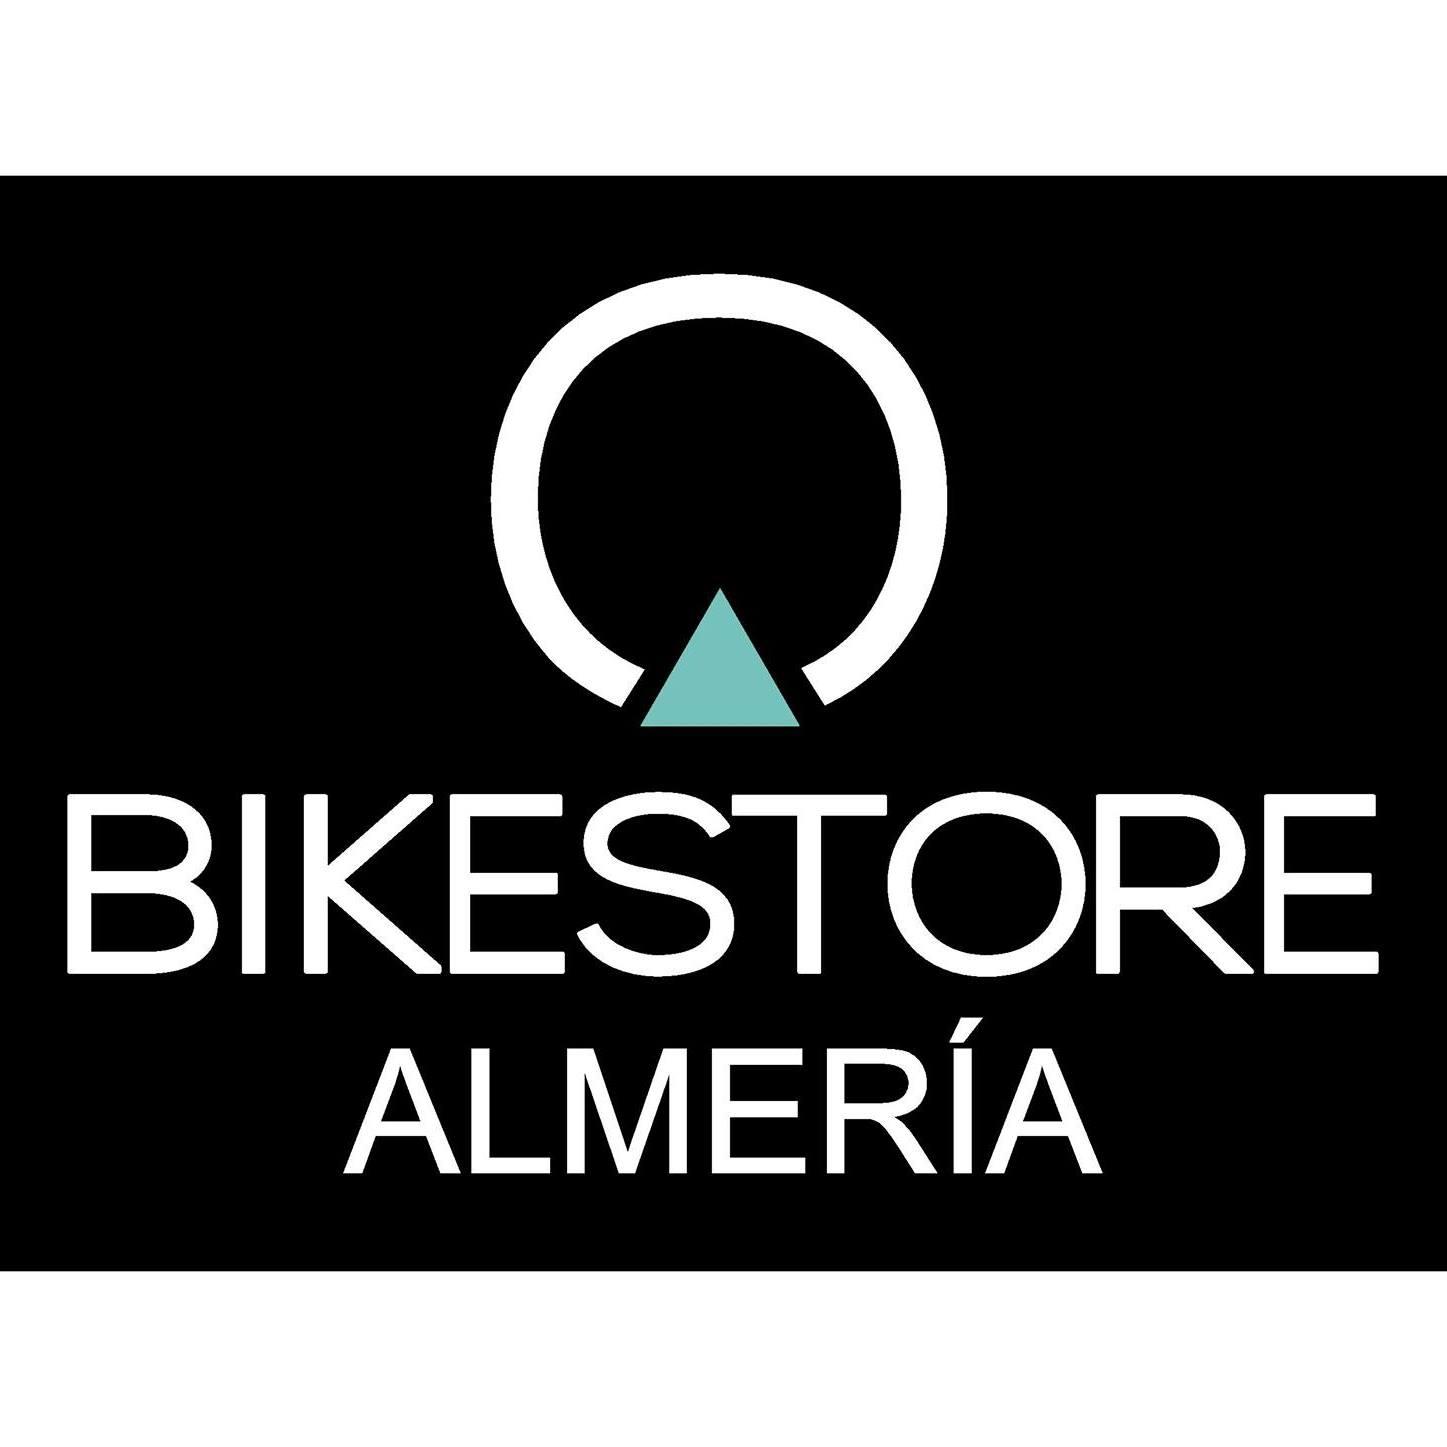 Bikestore Almerajpg